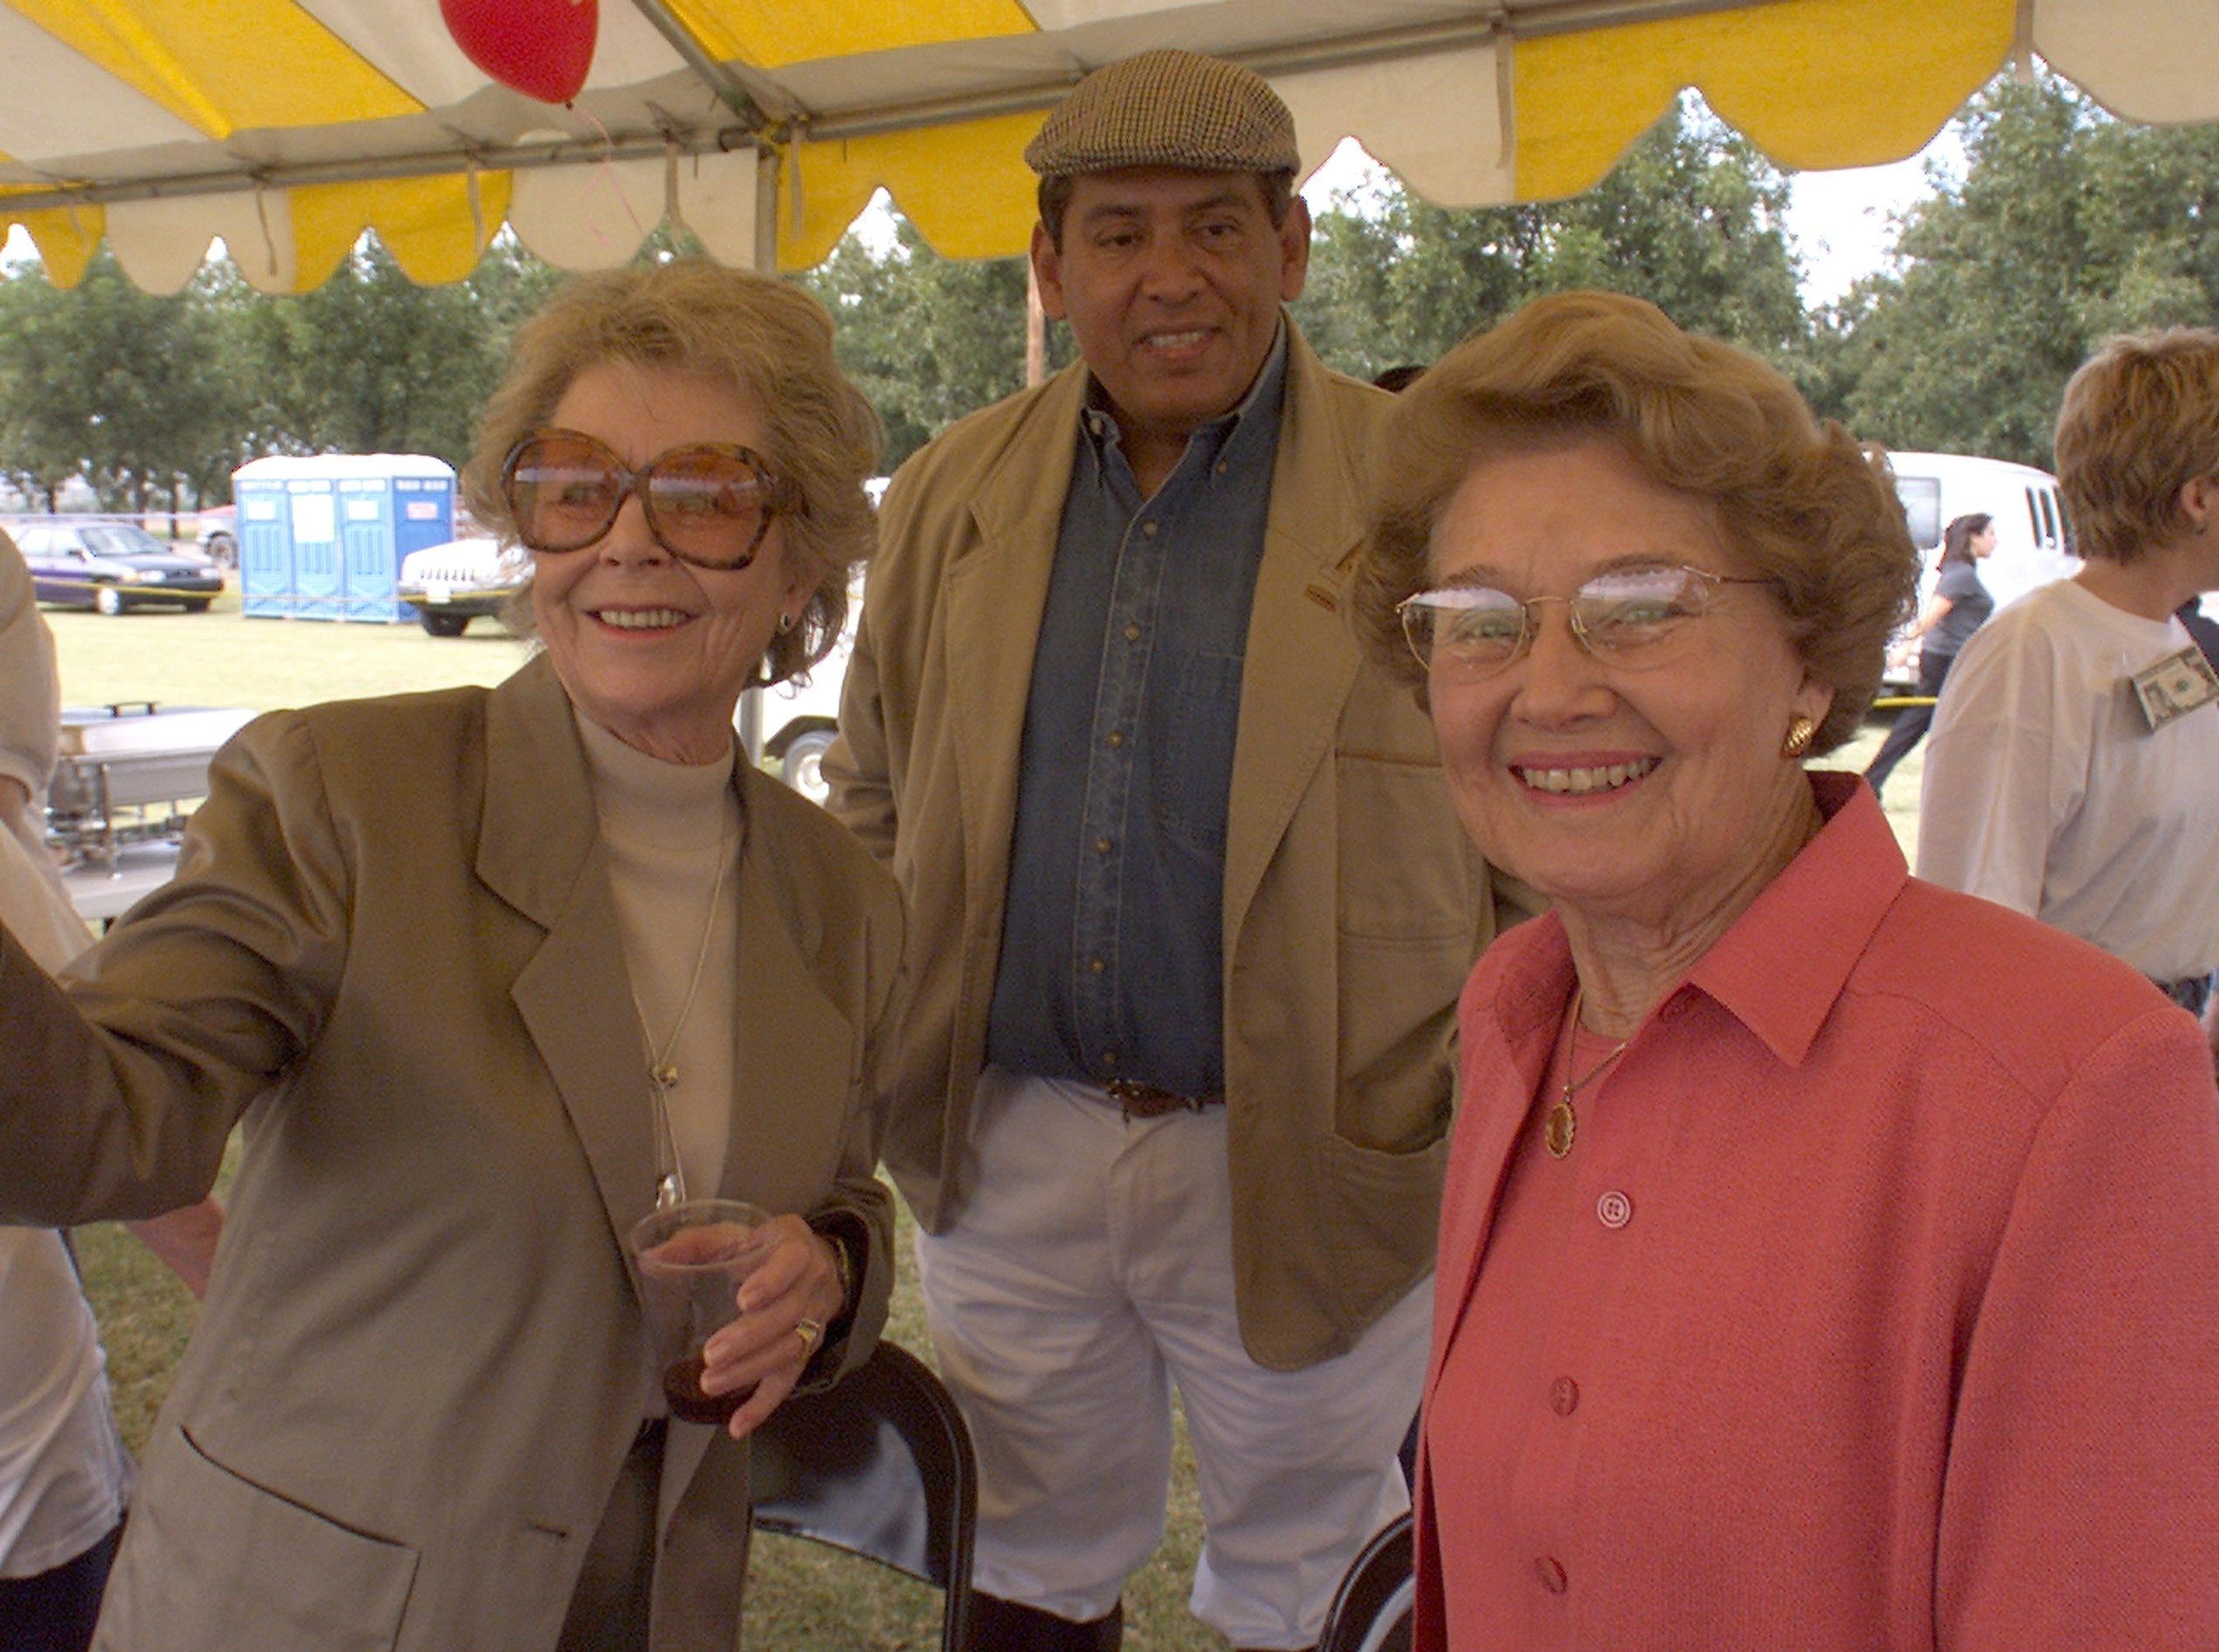 10/19/1999 Sue Ramsey, left, Dr. Raul Villalobos, center, and Jenna Welch.